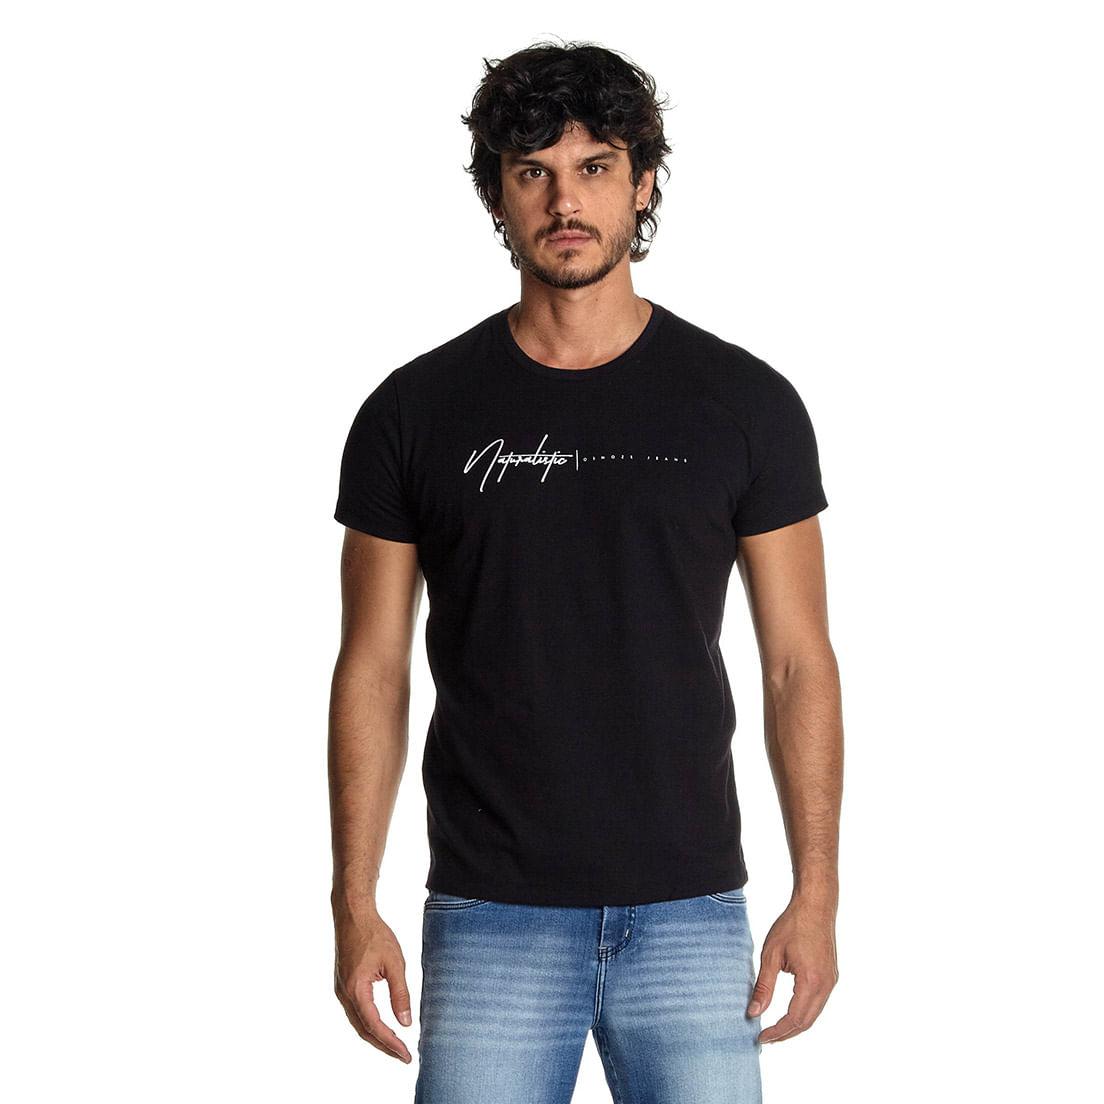 Camiseta Osmoze 09 110112818 Preto